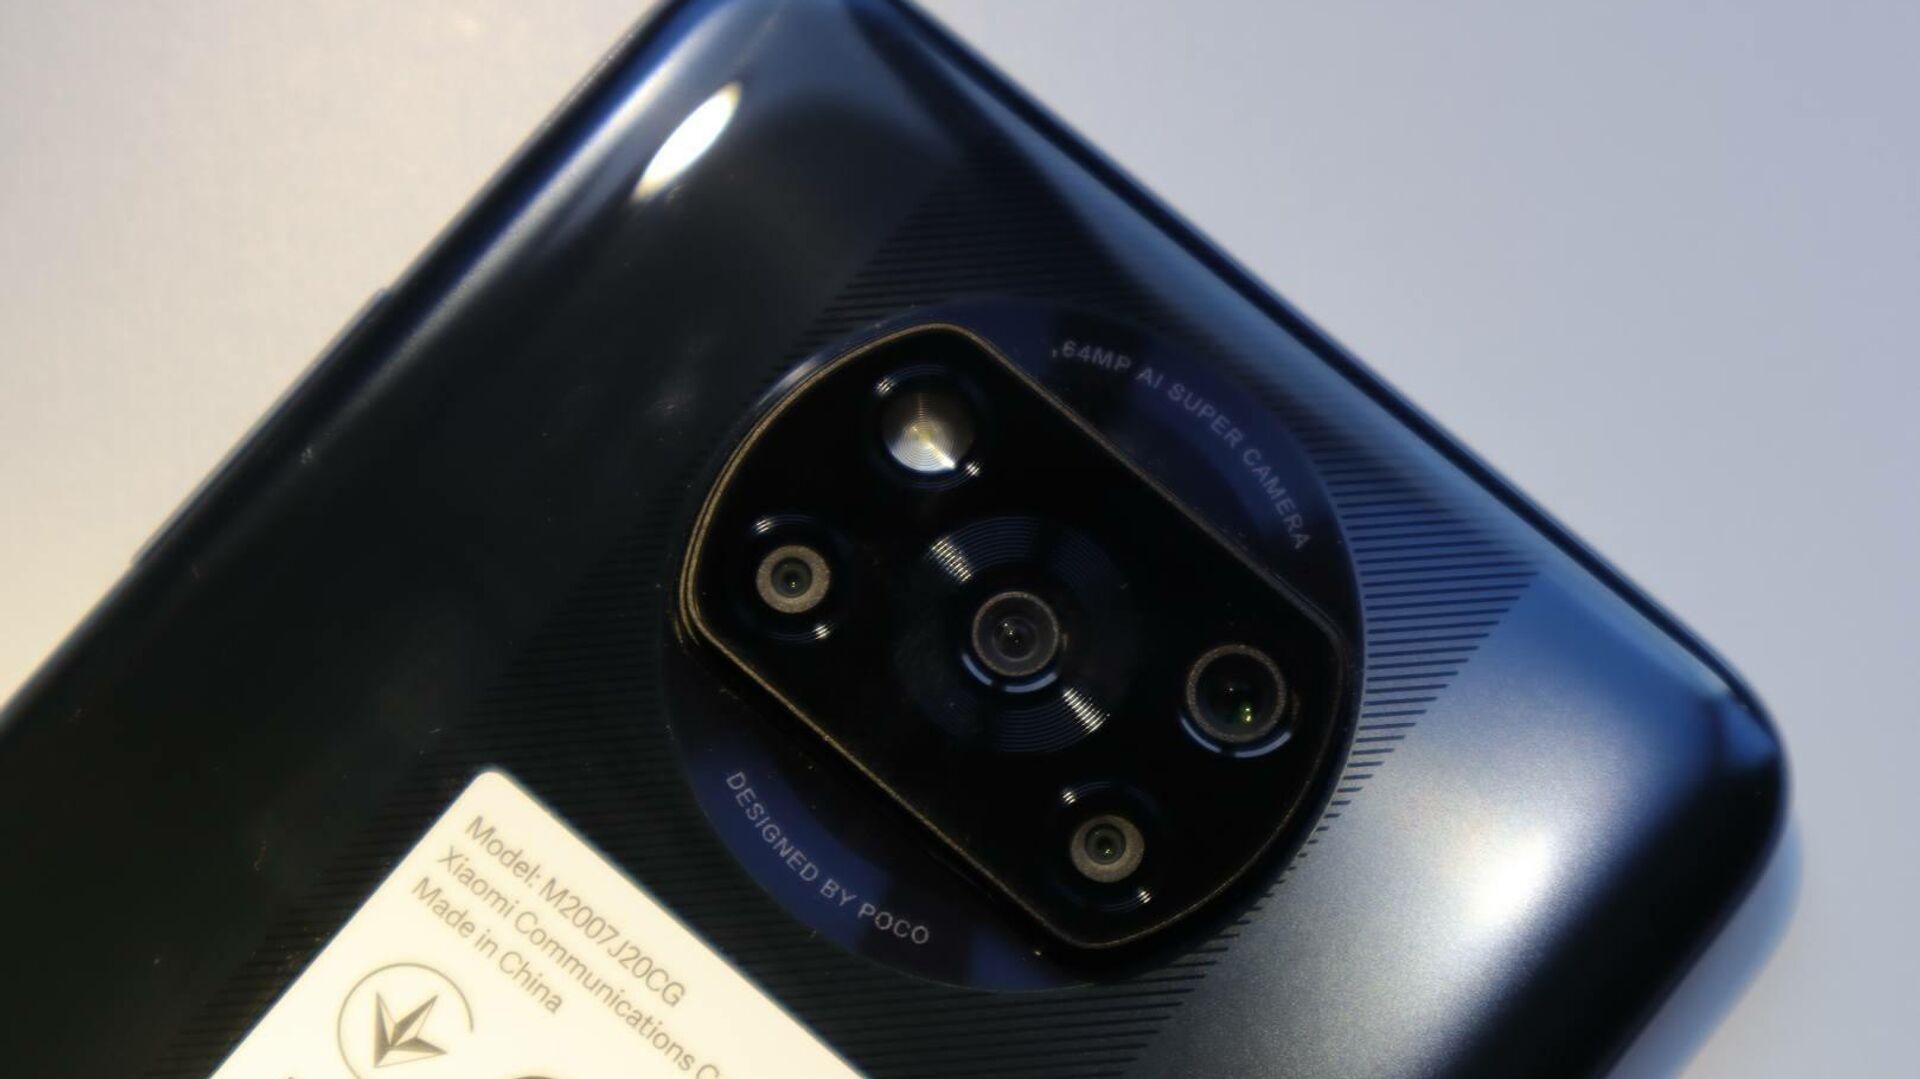 Xiaomi Poco X3 NFC - РИА Новости, 1920, 05.11.2020